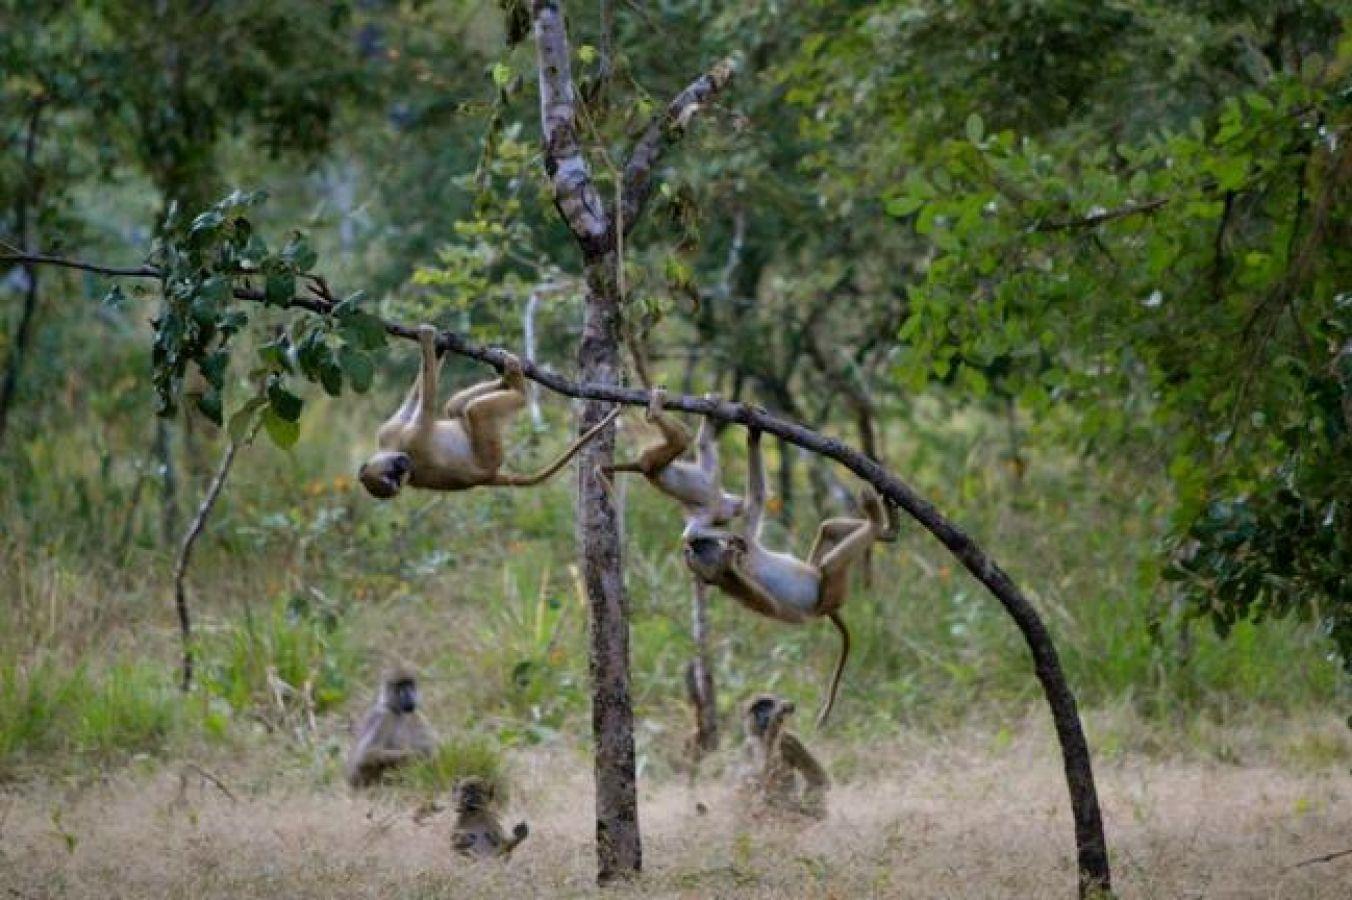 Kuti Wildlife Reserve Baboons